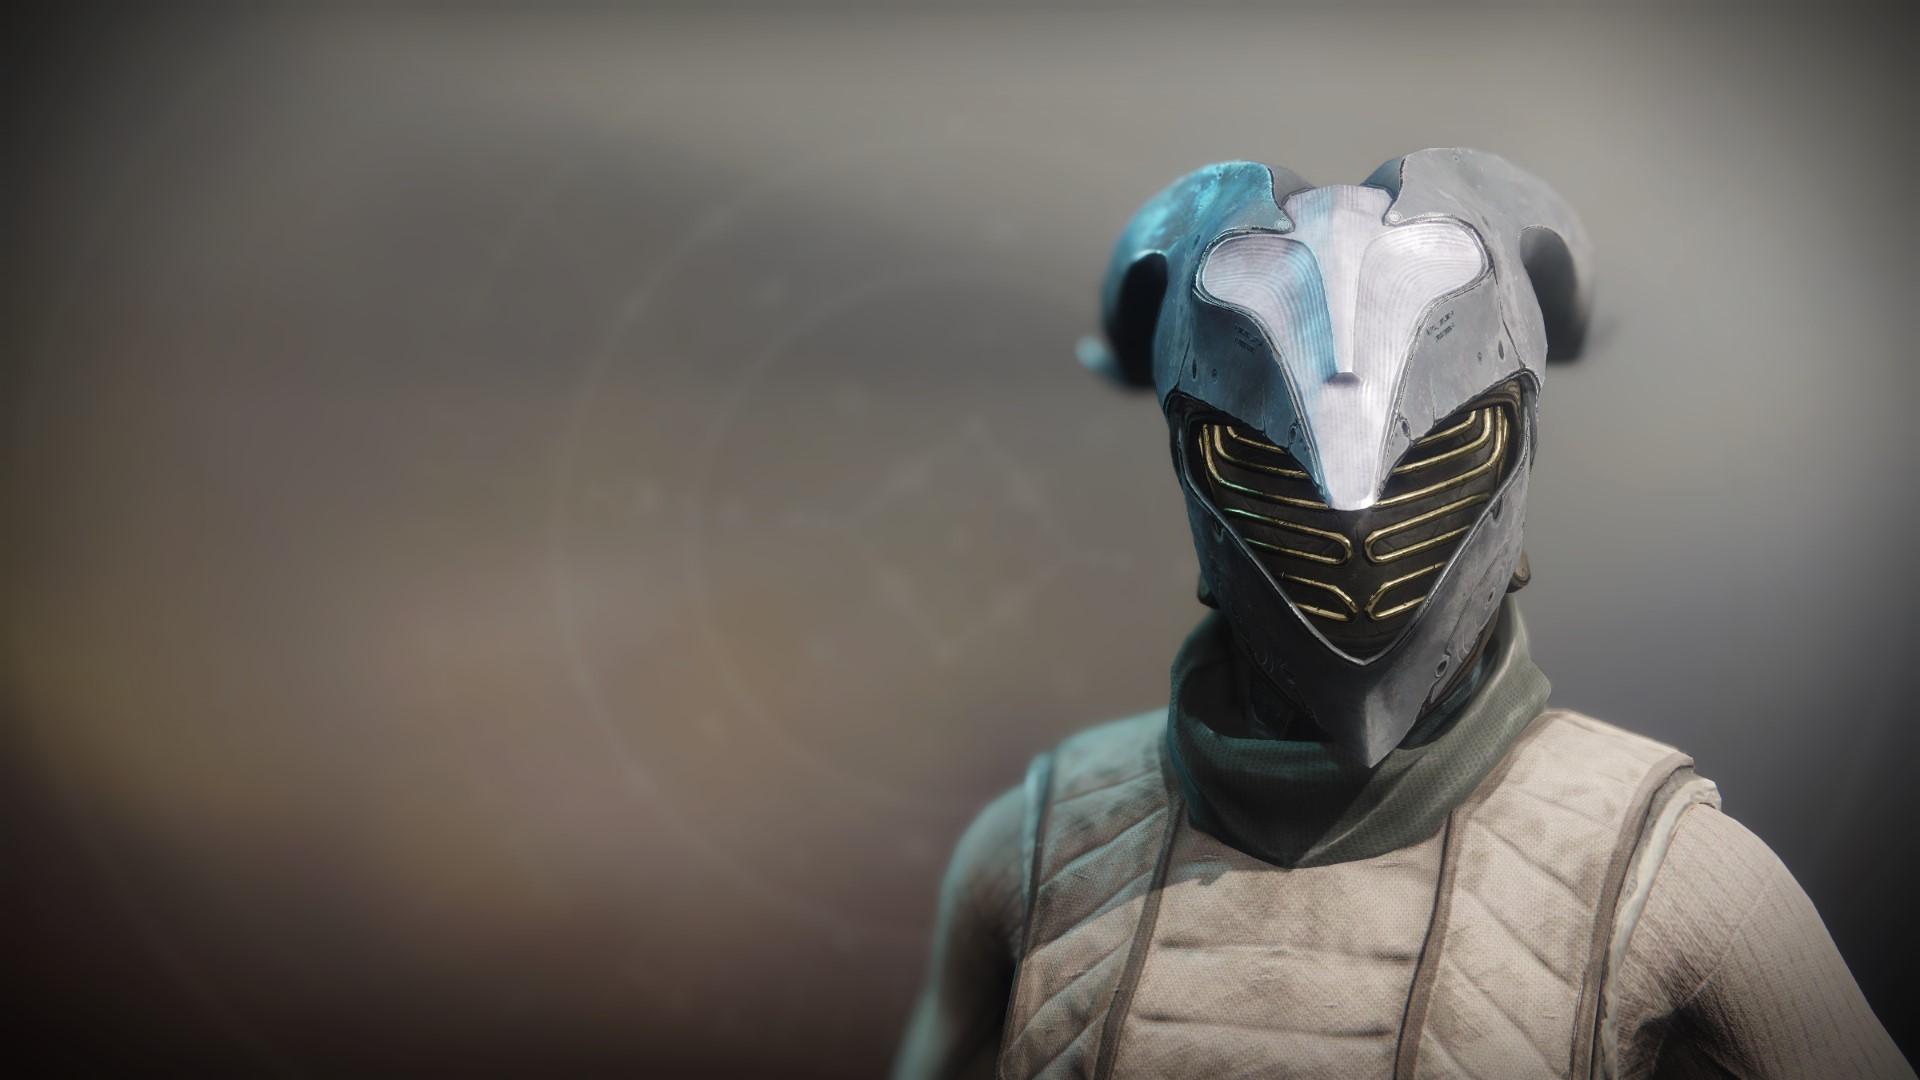 Hallowfire Heart Exotic Chest Armor